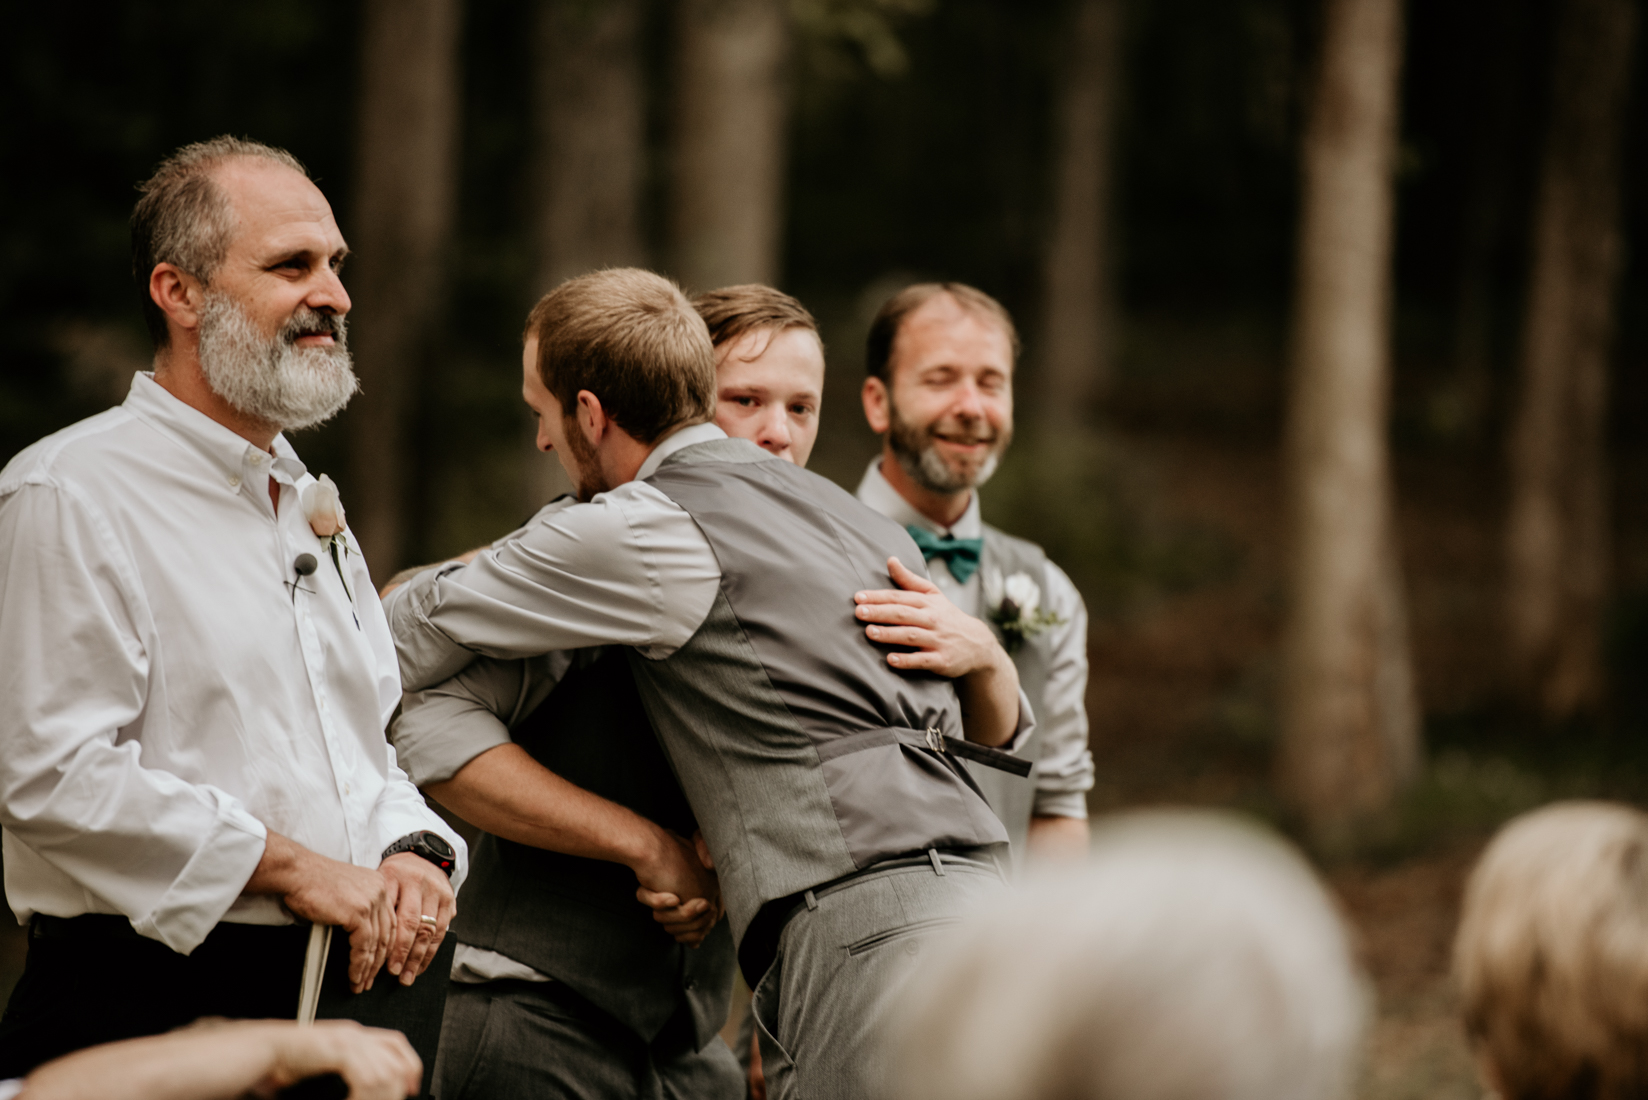 olivia_zay_wedding_09_2018-7596.jpg